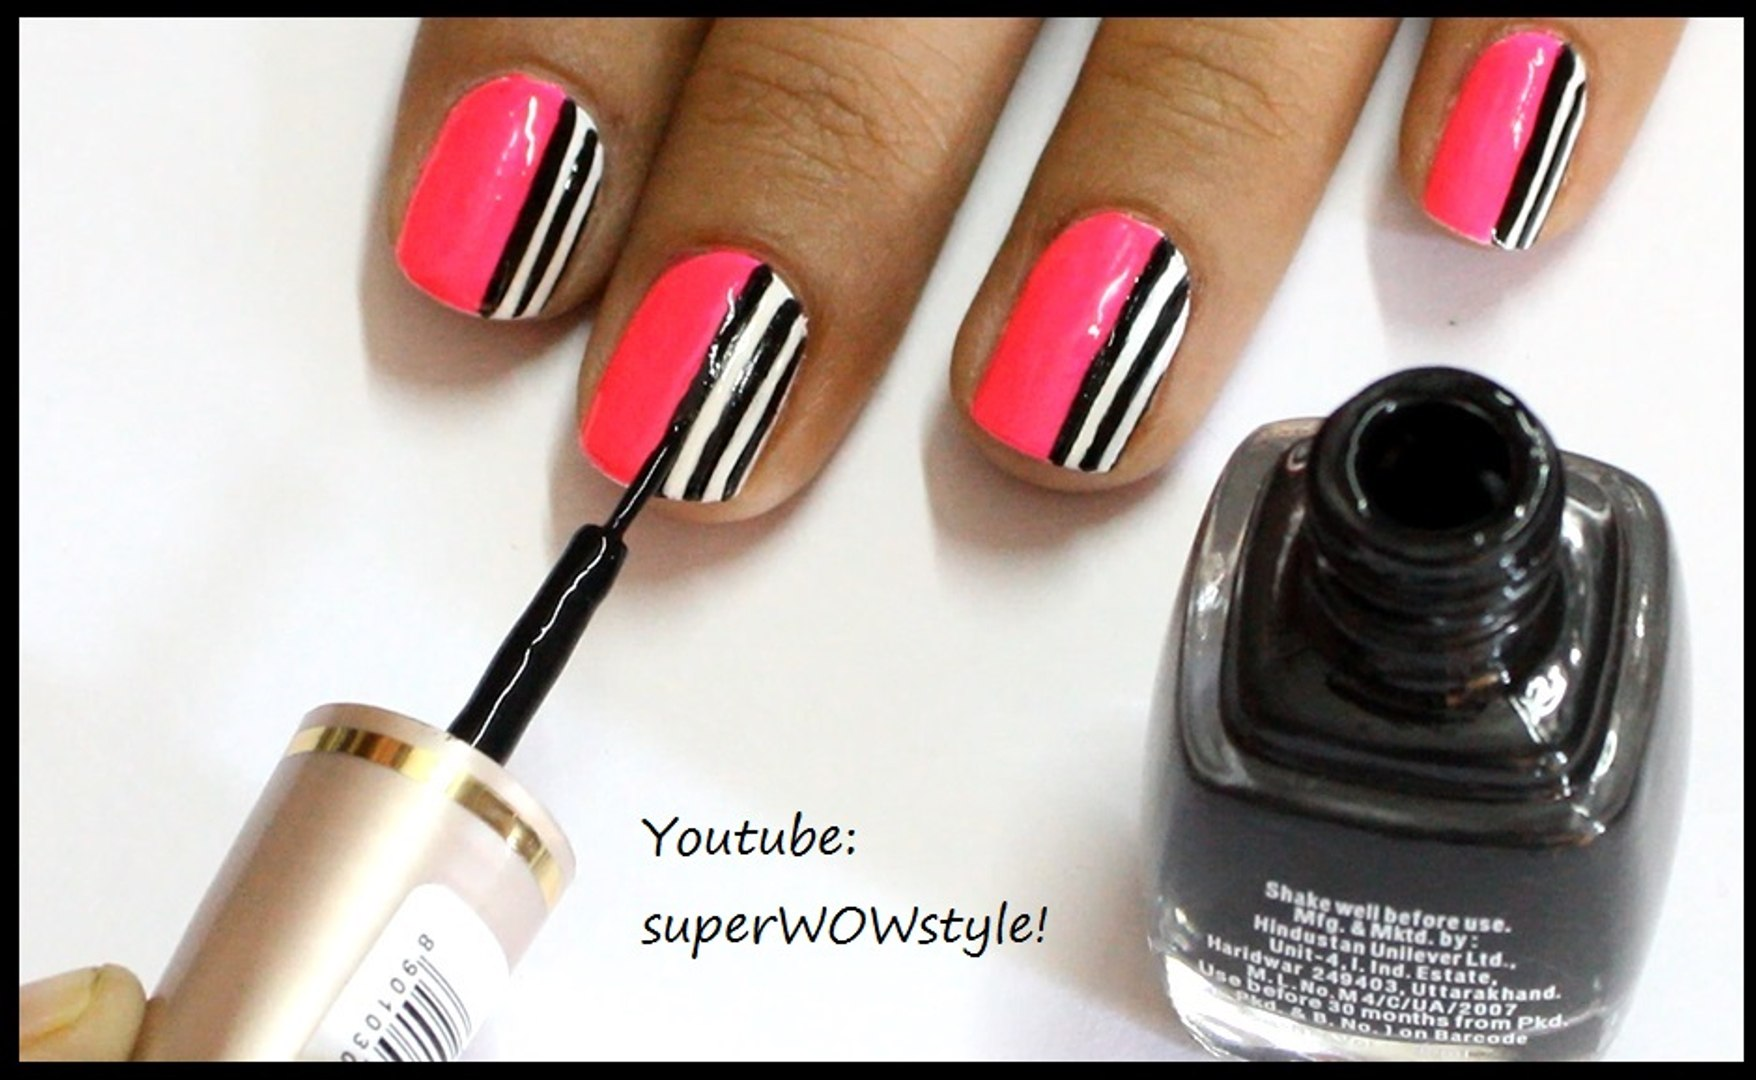 How To Make Nail Art Tools At Home Diy Nail Art Designs With Own Homemade Tools Eyeliner Brush Video Dailymotion